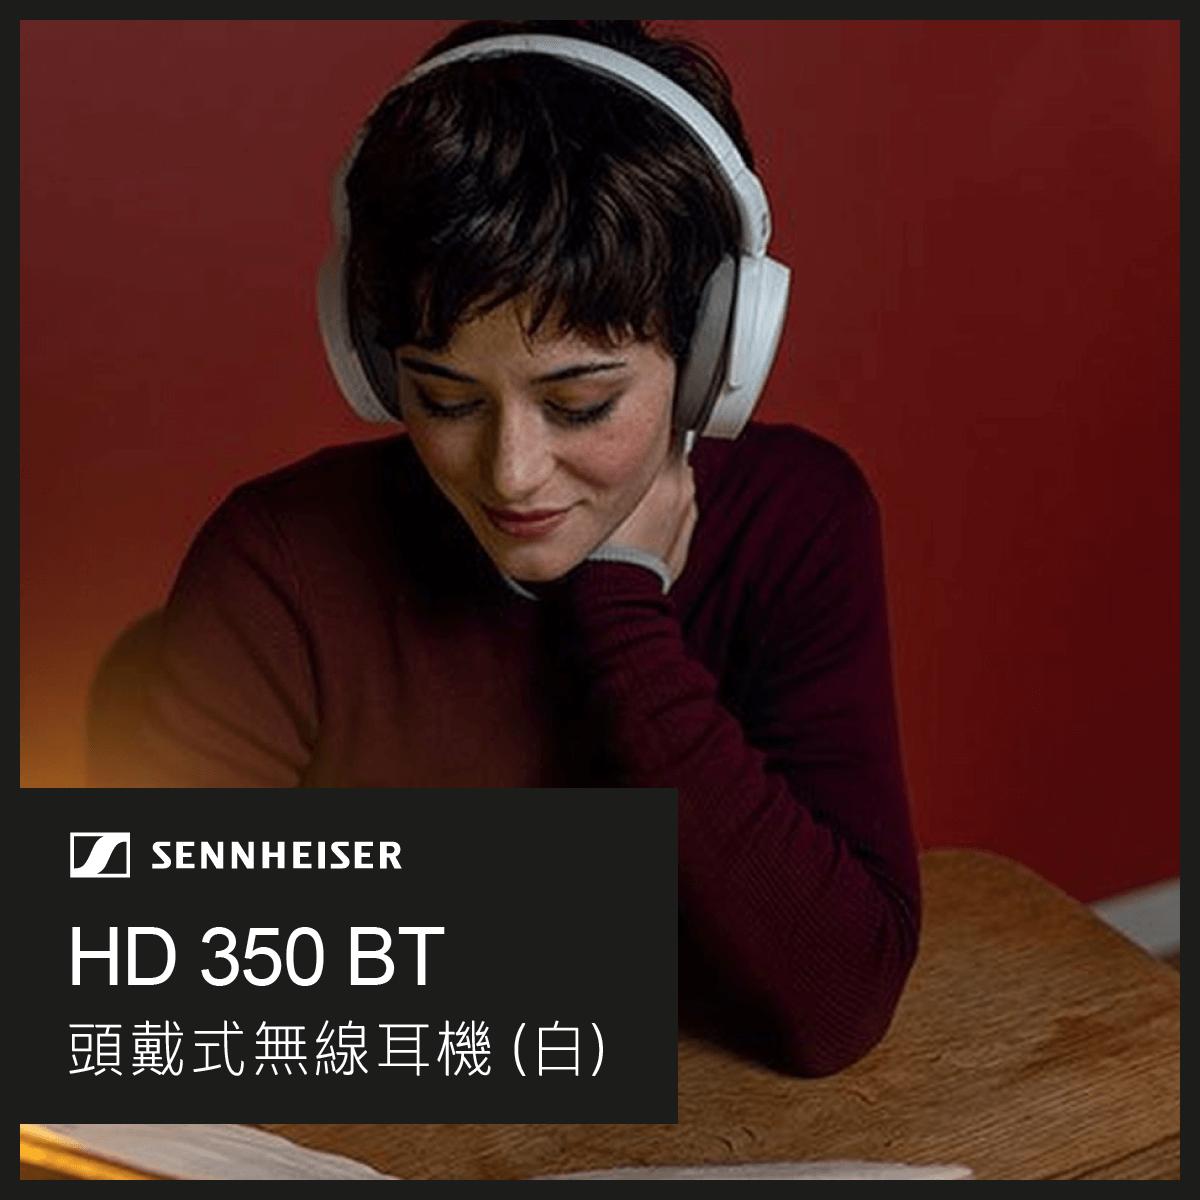 Sennheiser HD 350 BT (White)